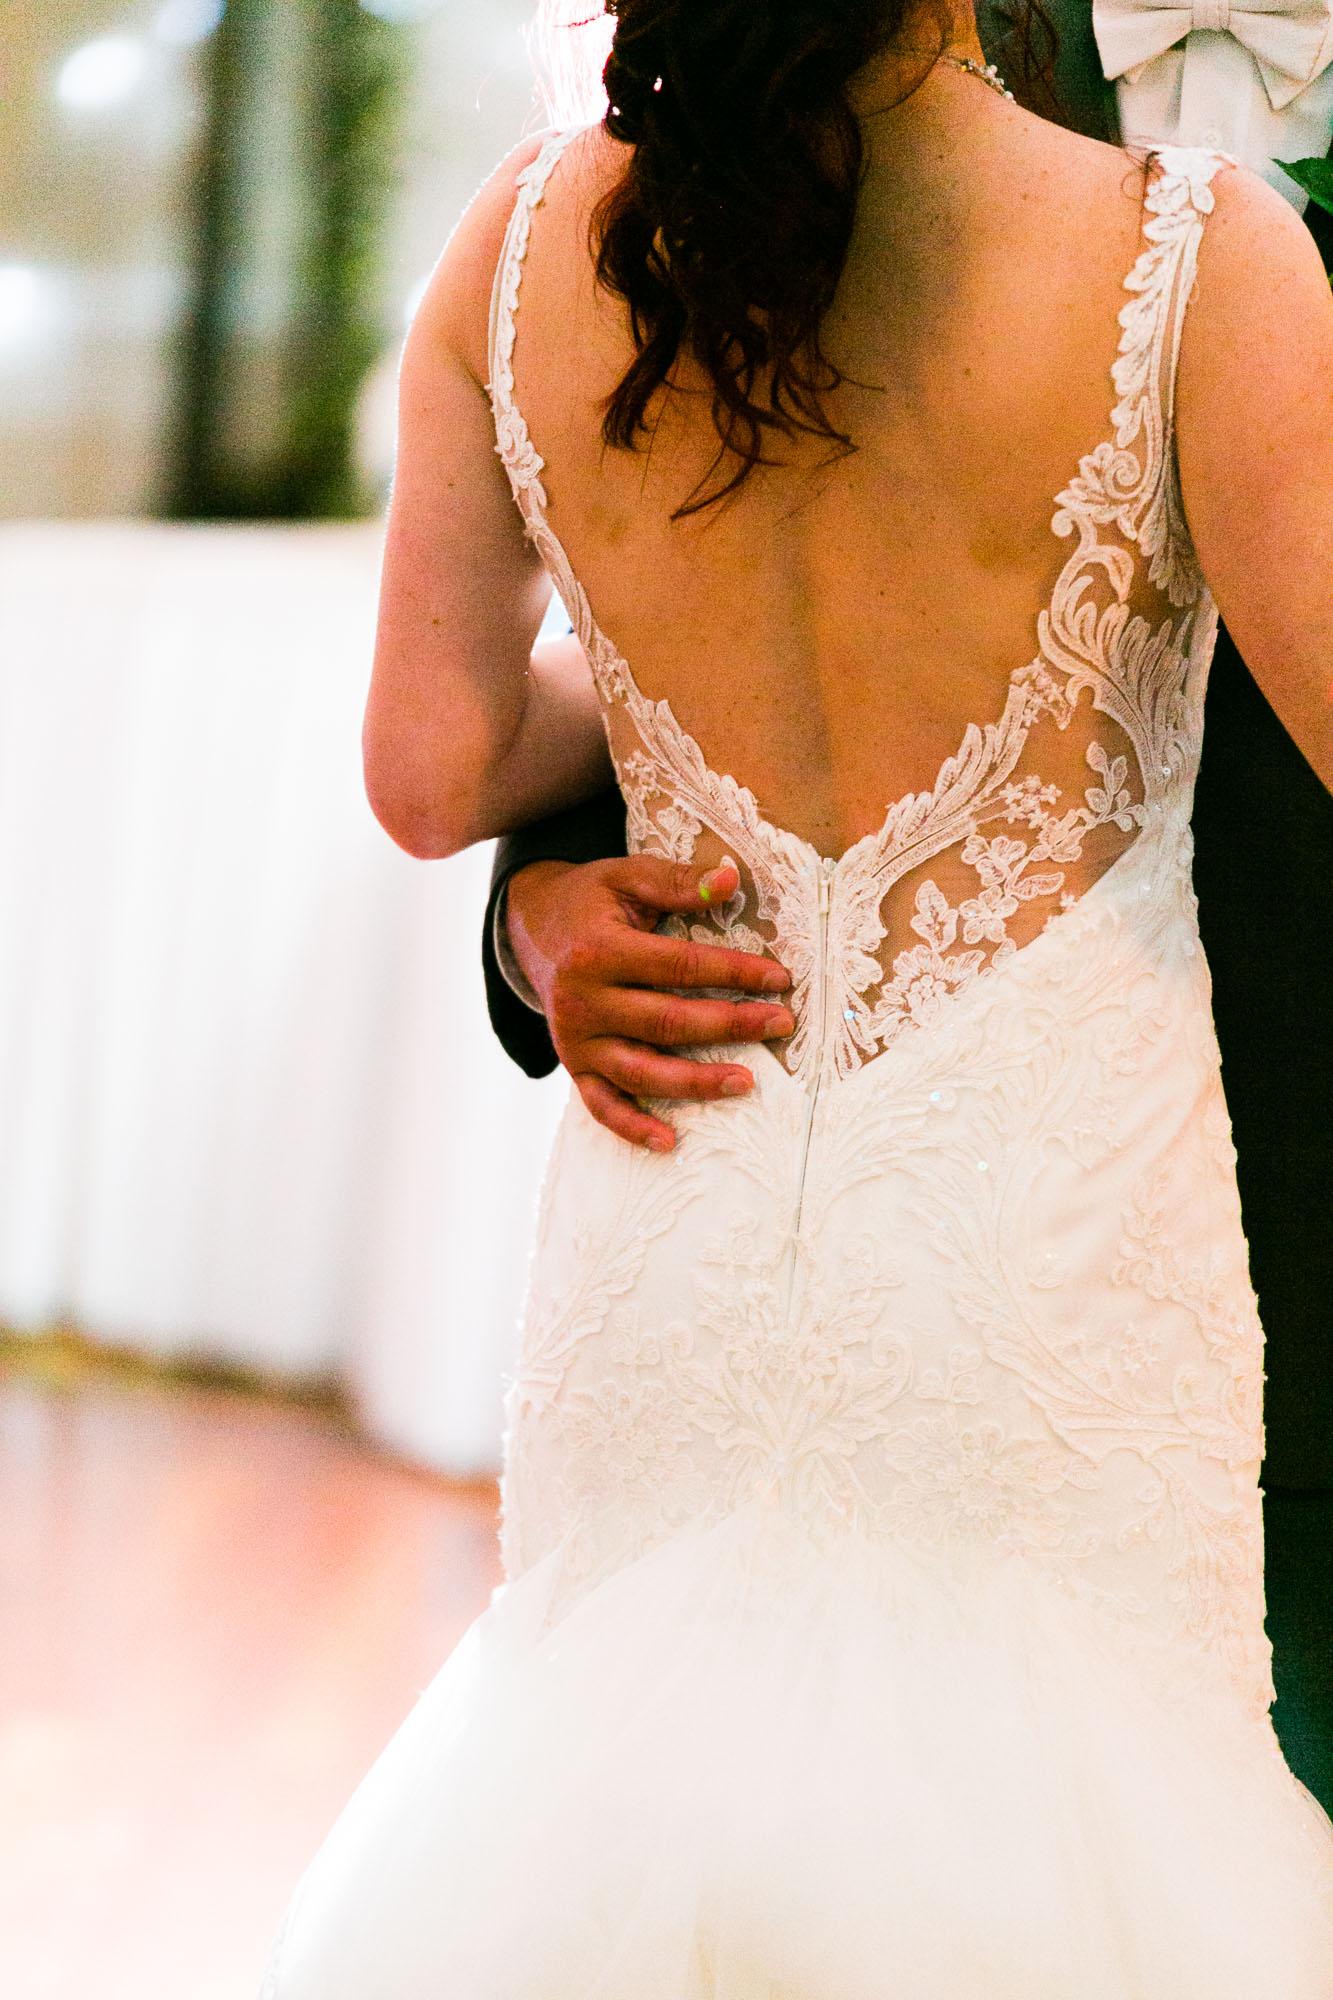 CLARION HOTEL WEDDING - 068.jpg